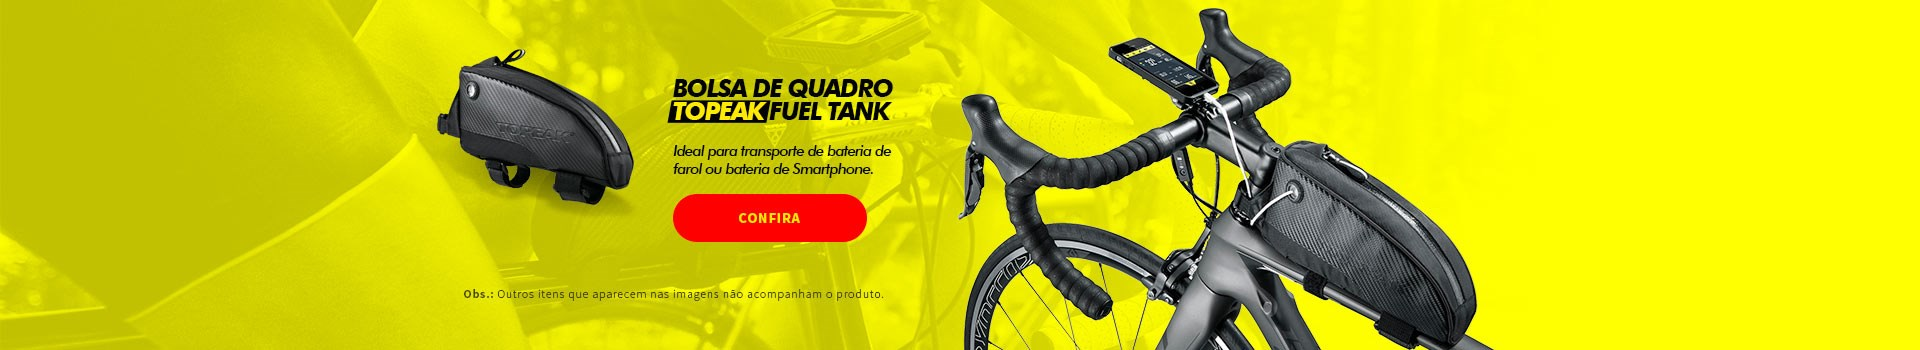 Bolsa De Quadro Topeak Fuel Tank